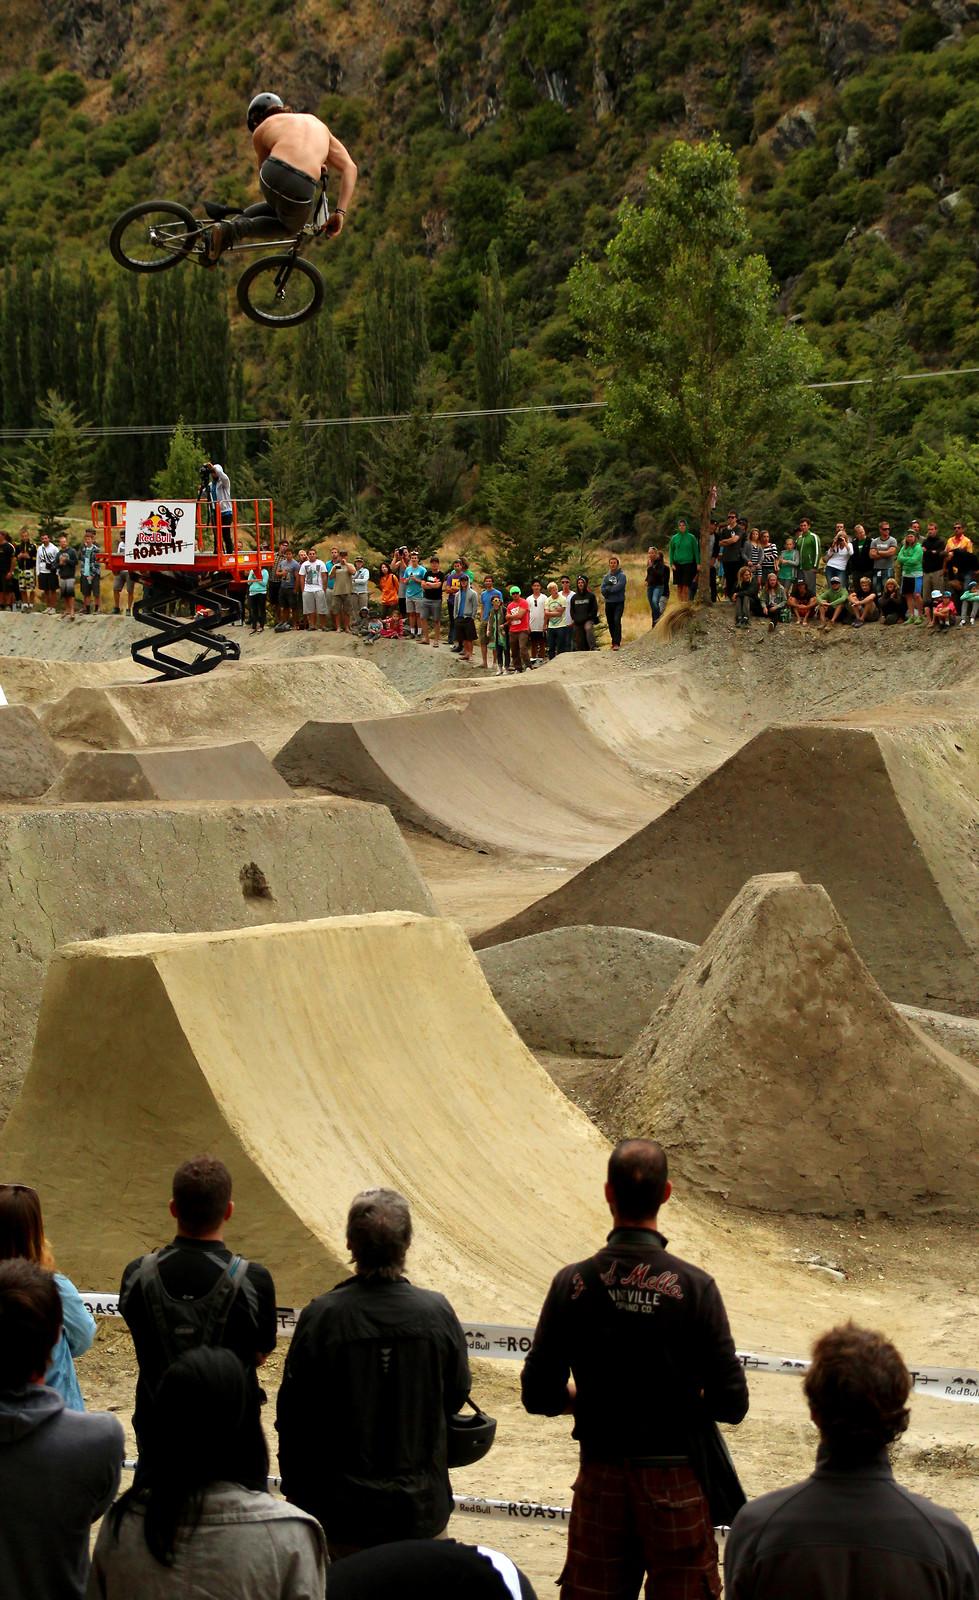 Whipped Cream for that crowd! - jonbokrantz - Mountain Biking Pictures - Vital MTB